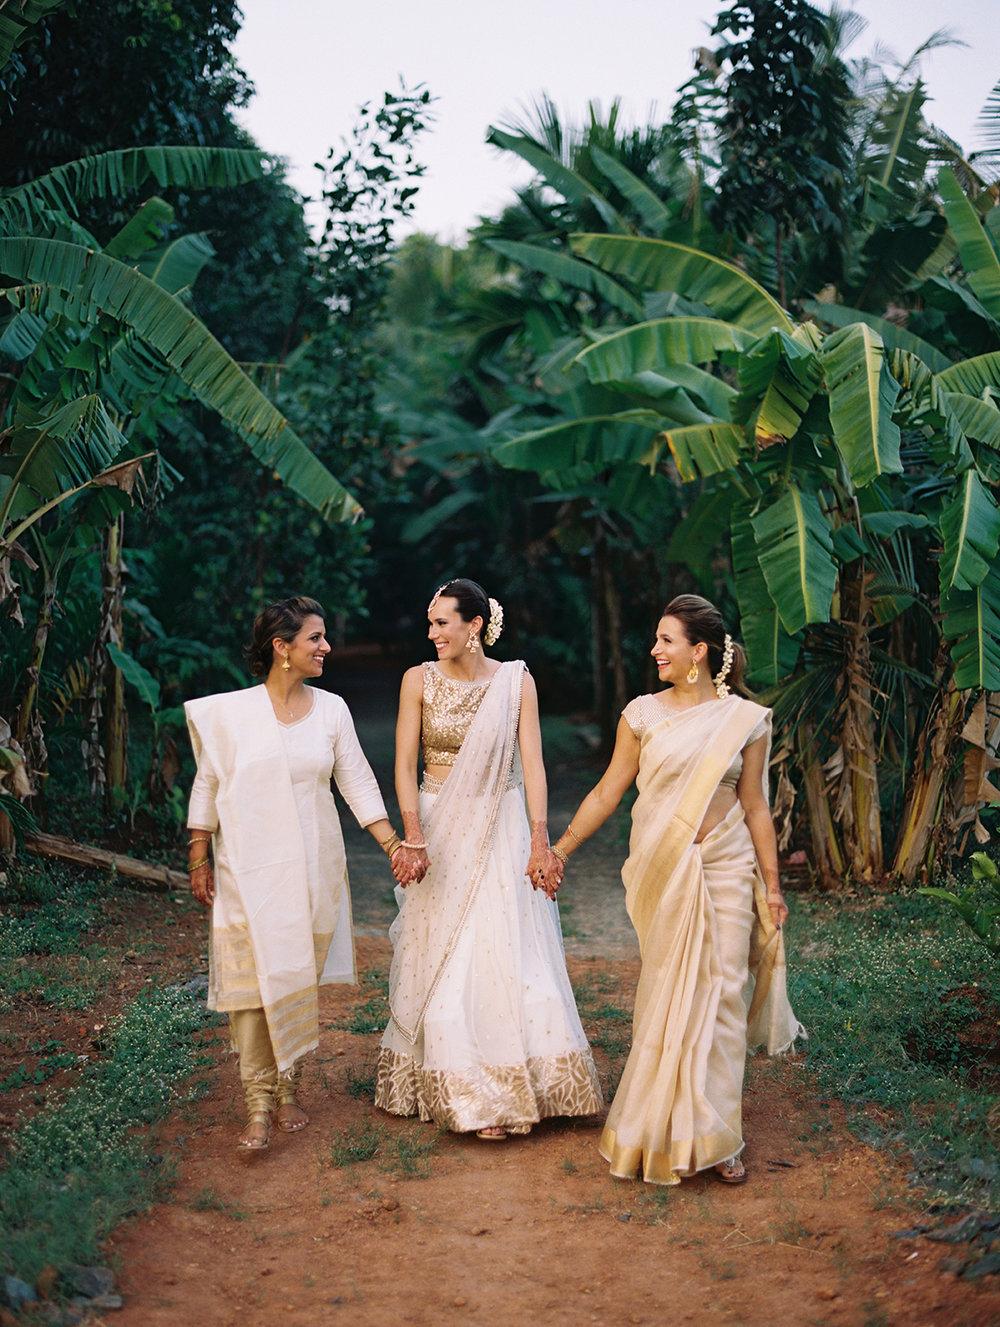 152-fine-art-film-photography-india-engagement-david-ali-brumley-wells.jpg